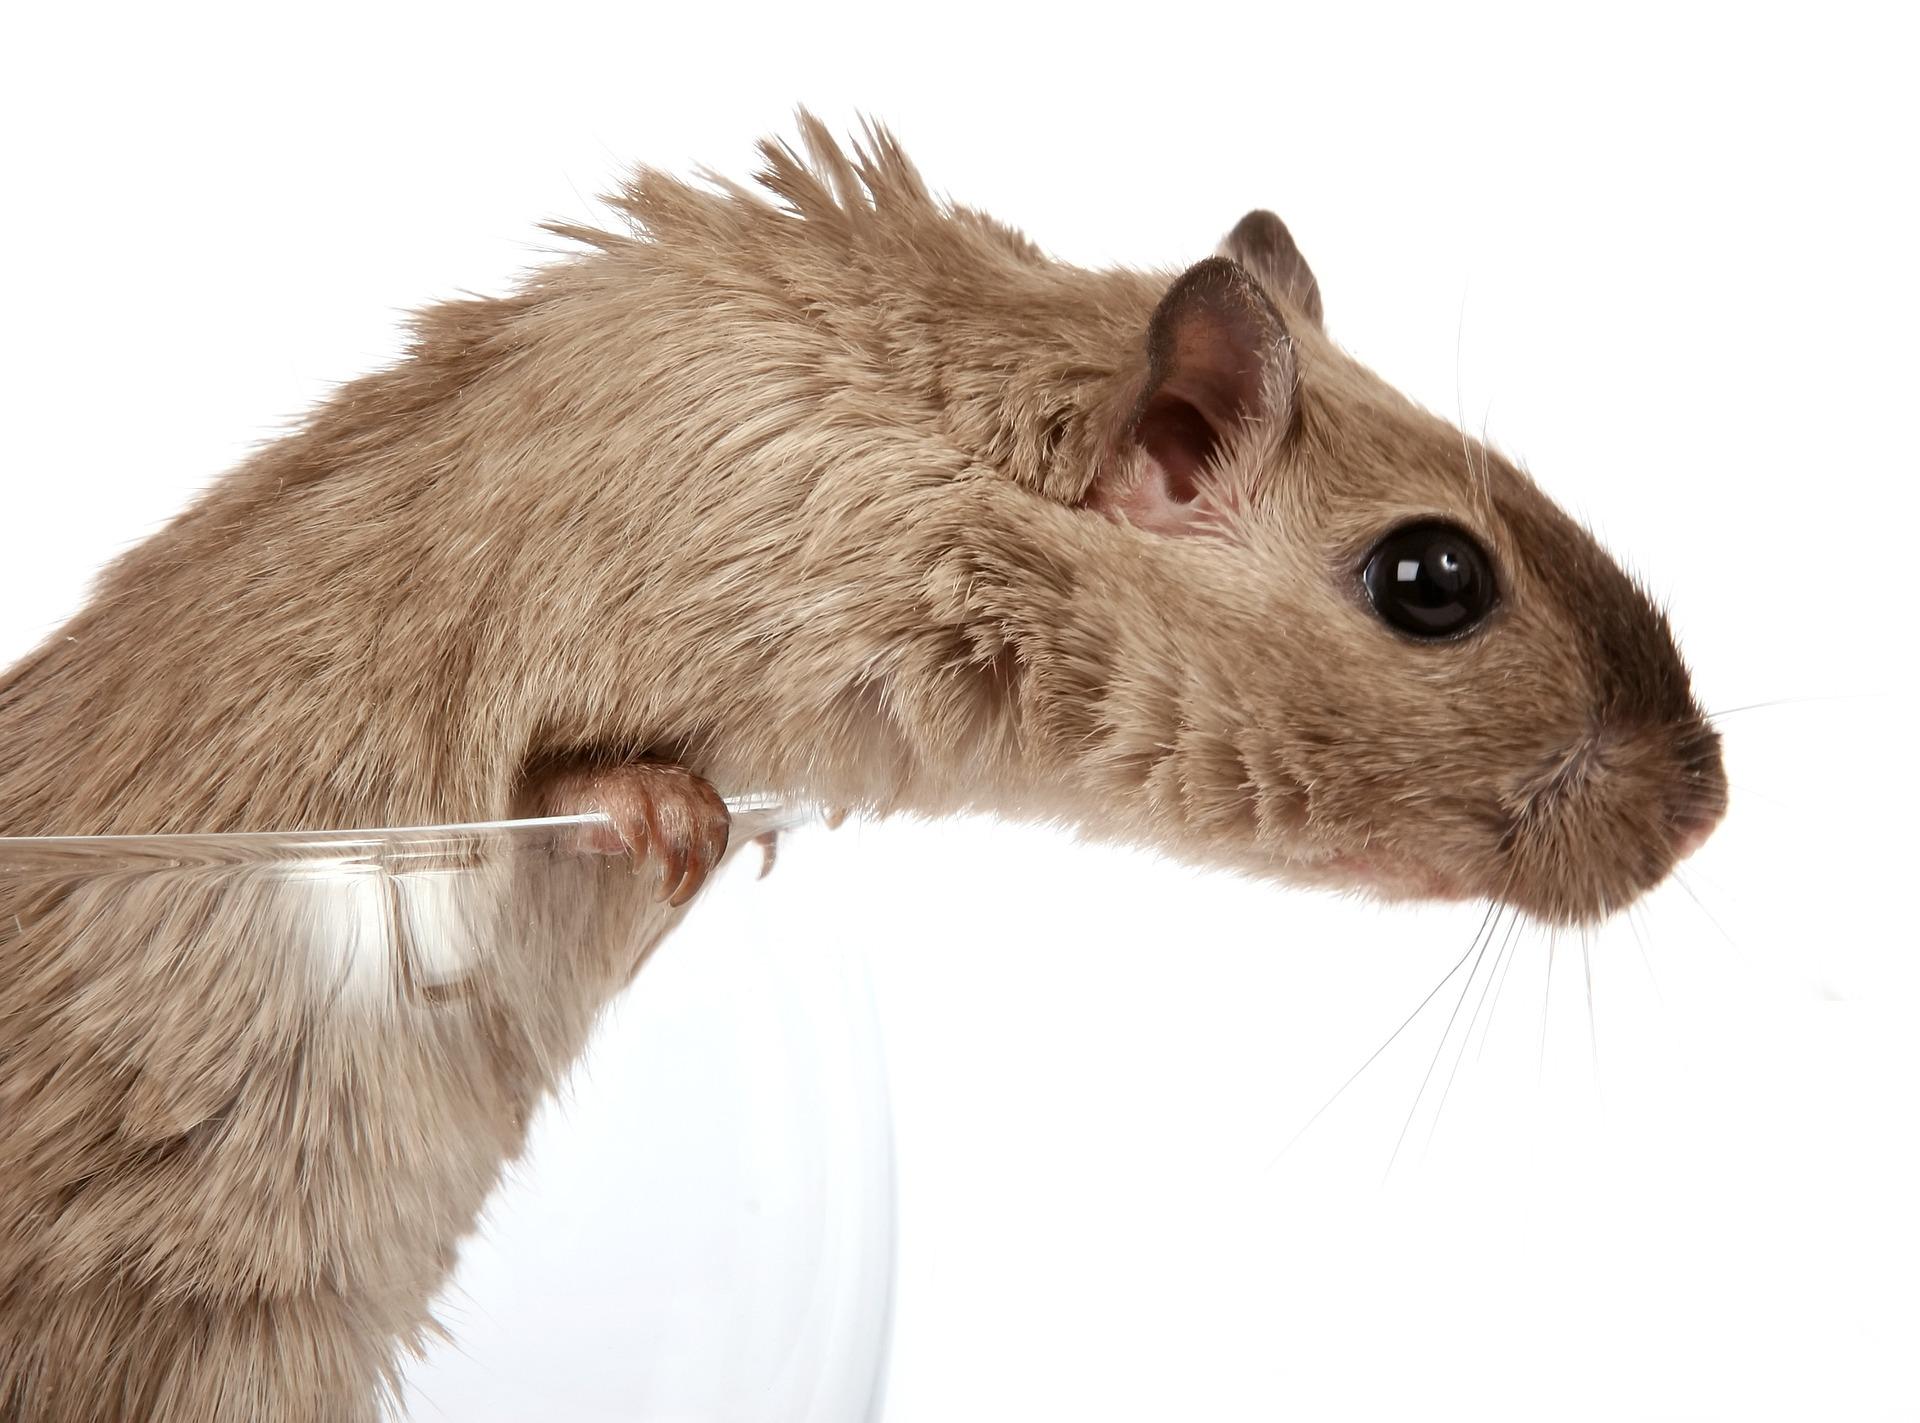 mices-pest-control-aaahomemaster-com-jpg